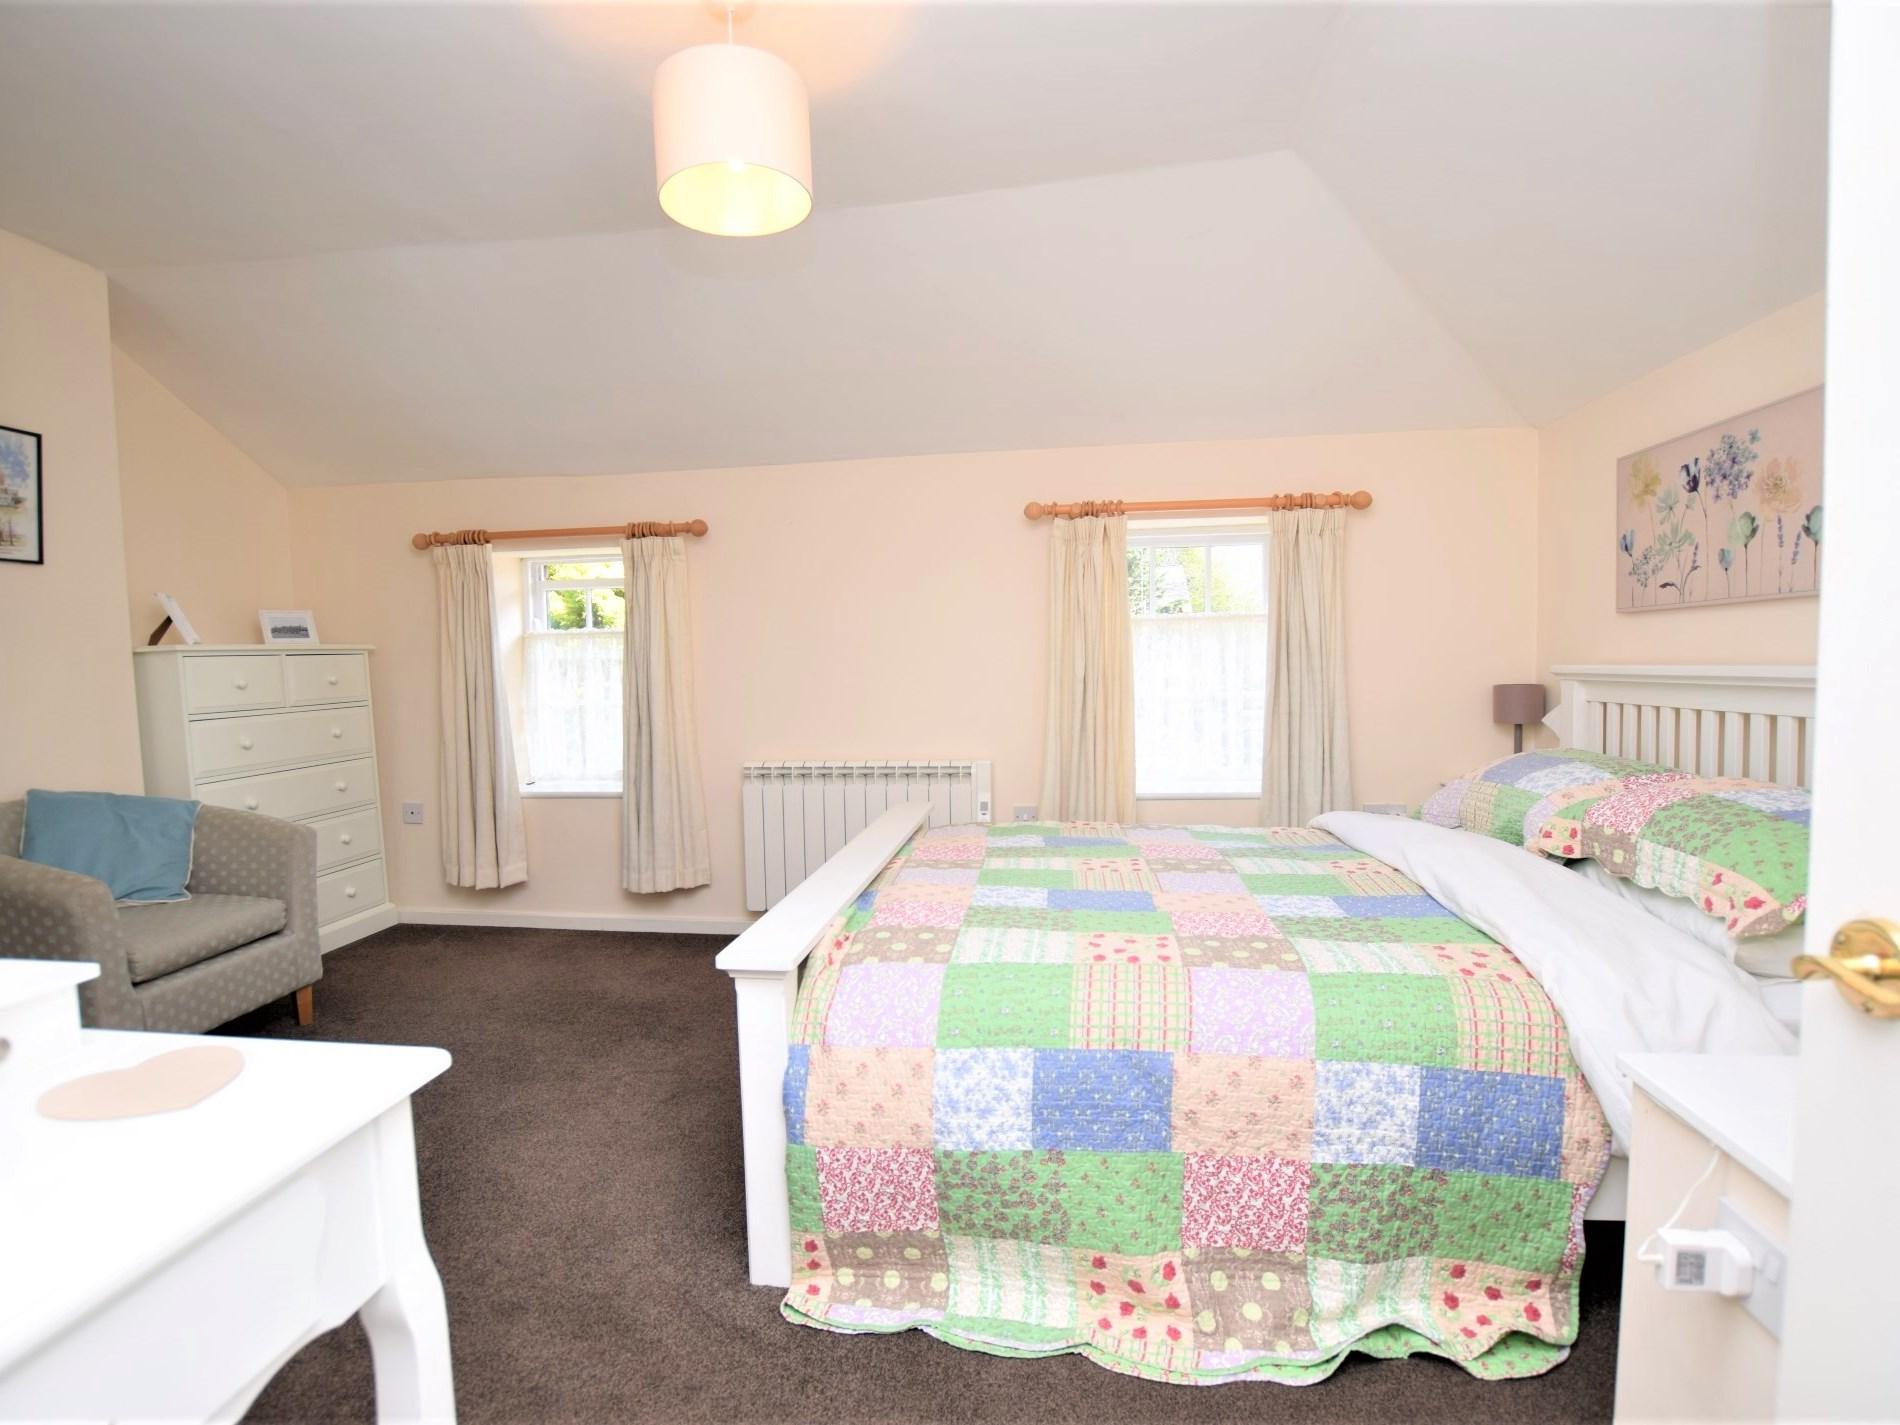 1 Bedroom Cottage in Wymondham, East Anglia